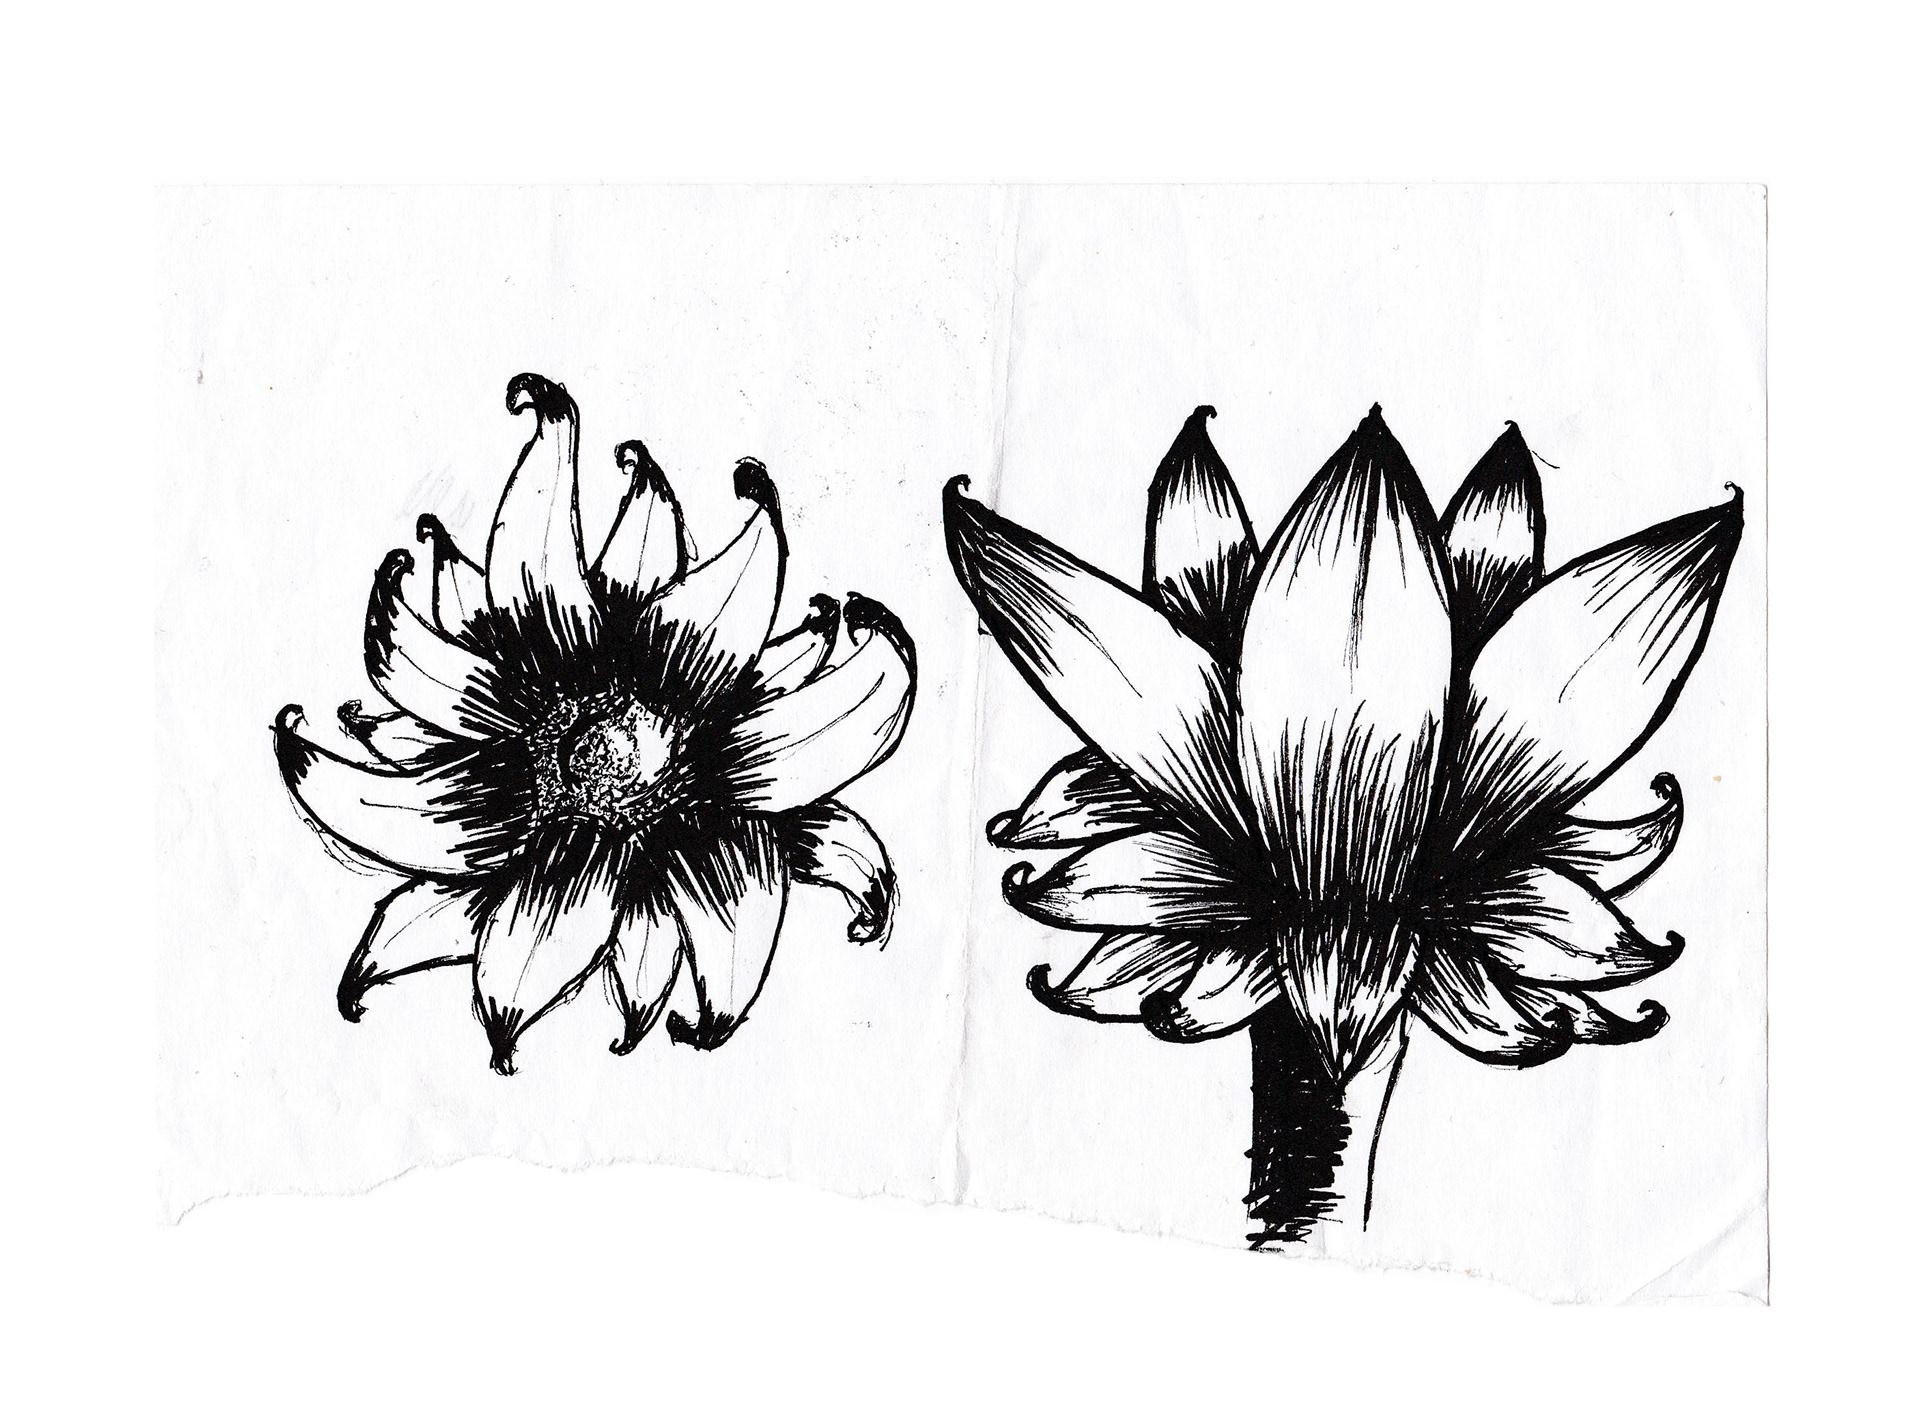 Sunflower Line Drawing : Chris england flower illustrations